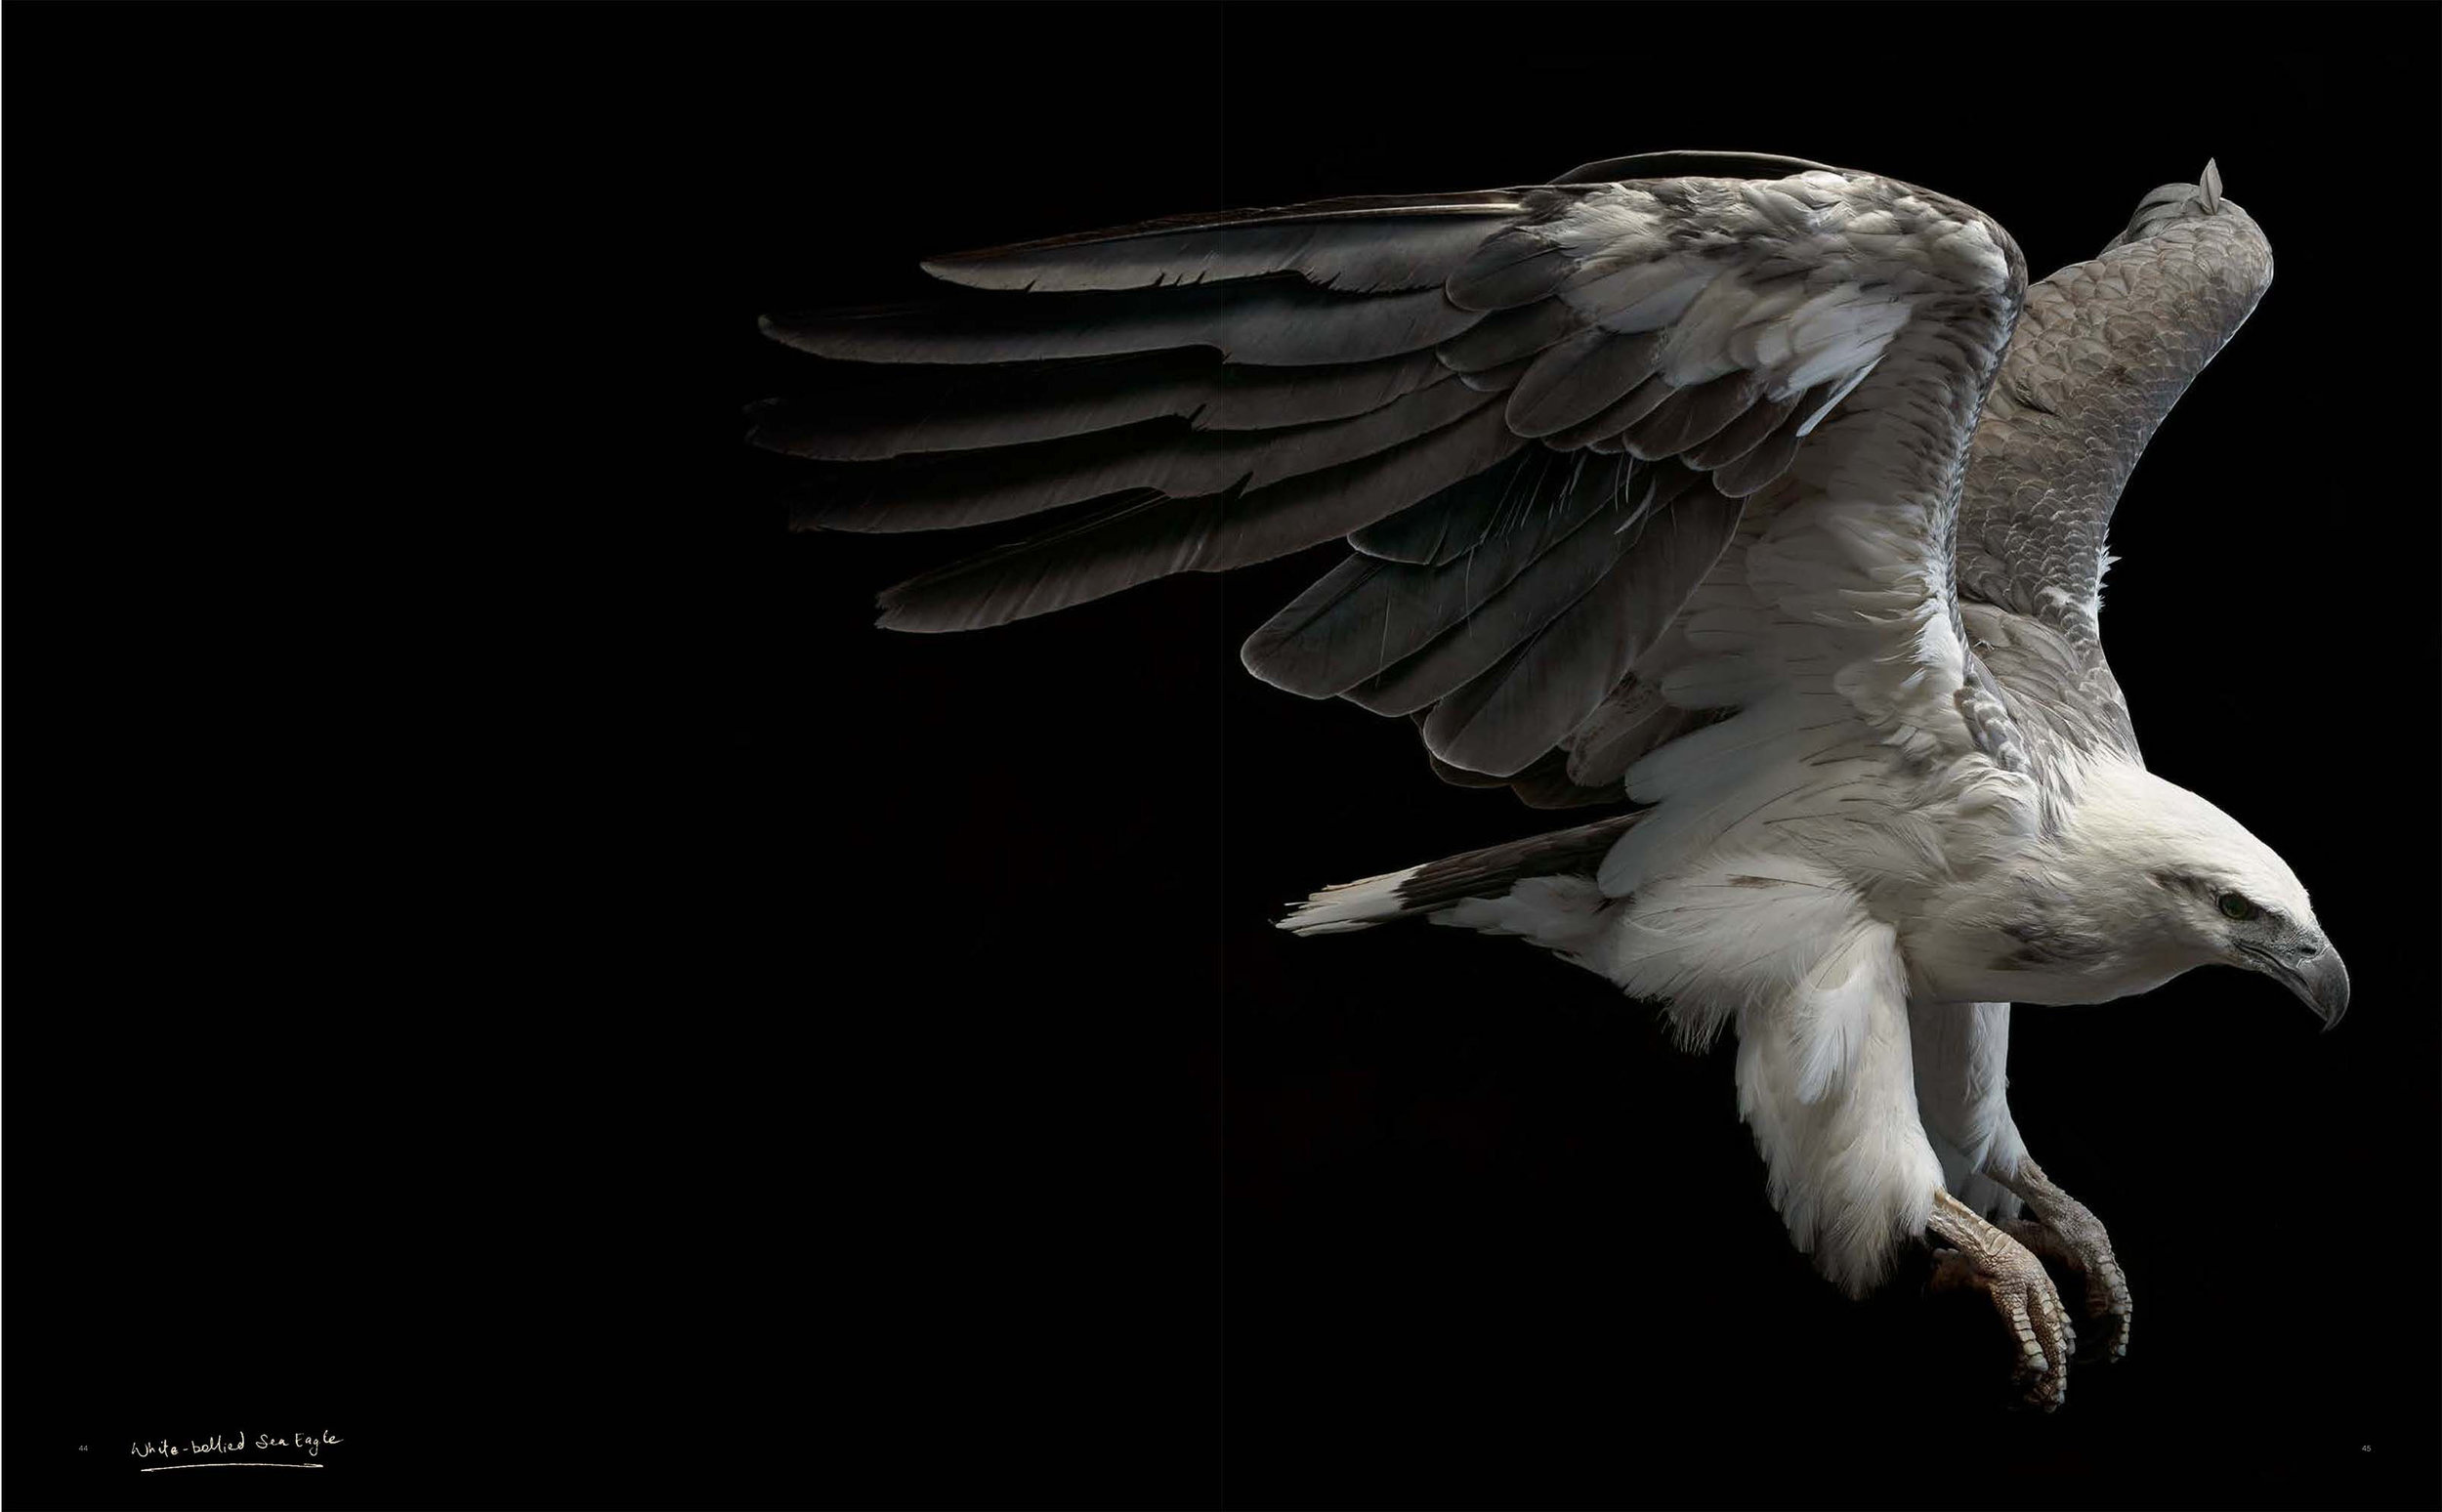 BIRD Gary Heery Book-completemmockup-47.jpg